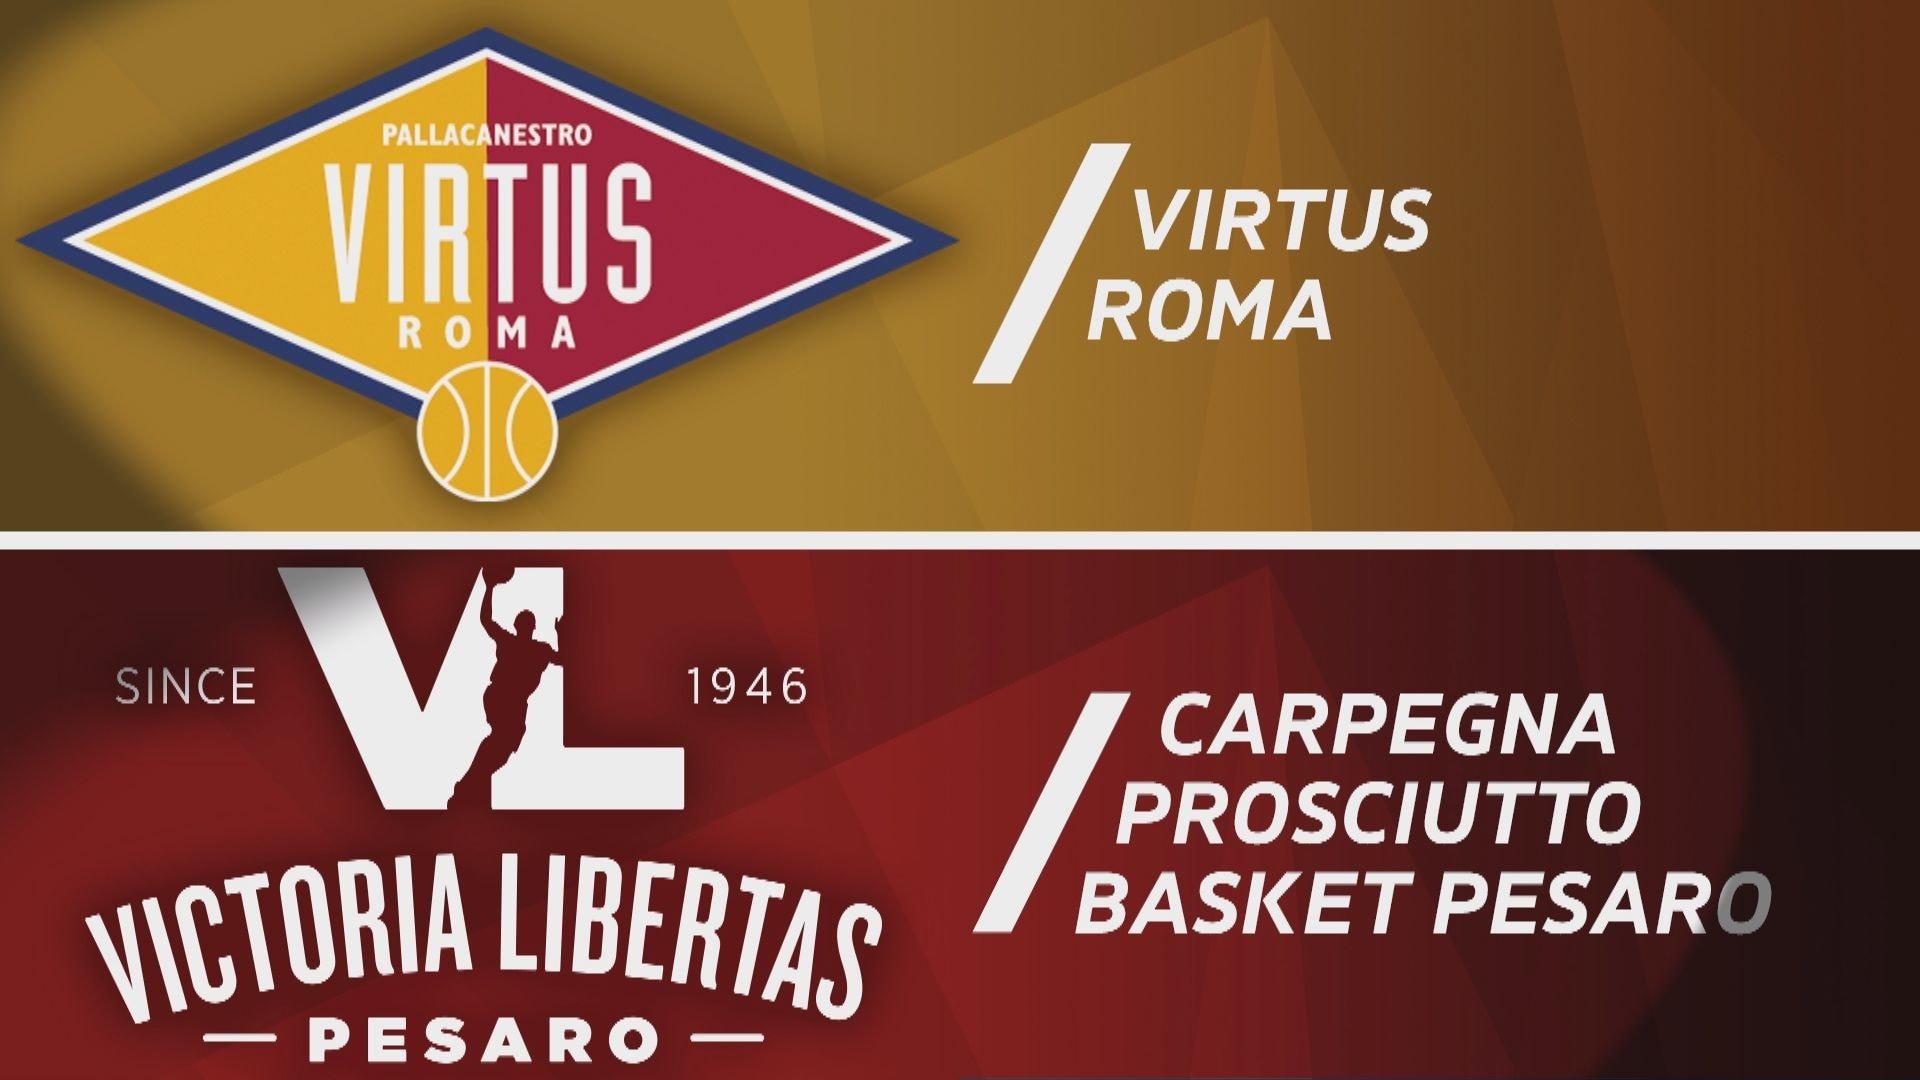 Virtus Roma - Carpegna Prosciutto Pesaro 69-84